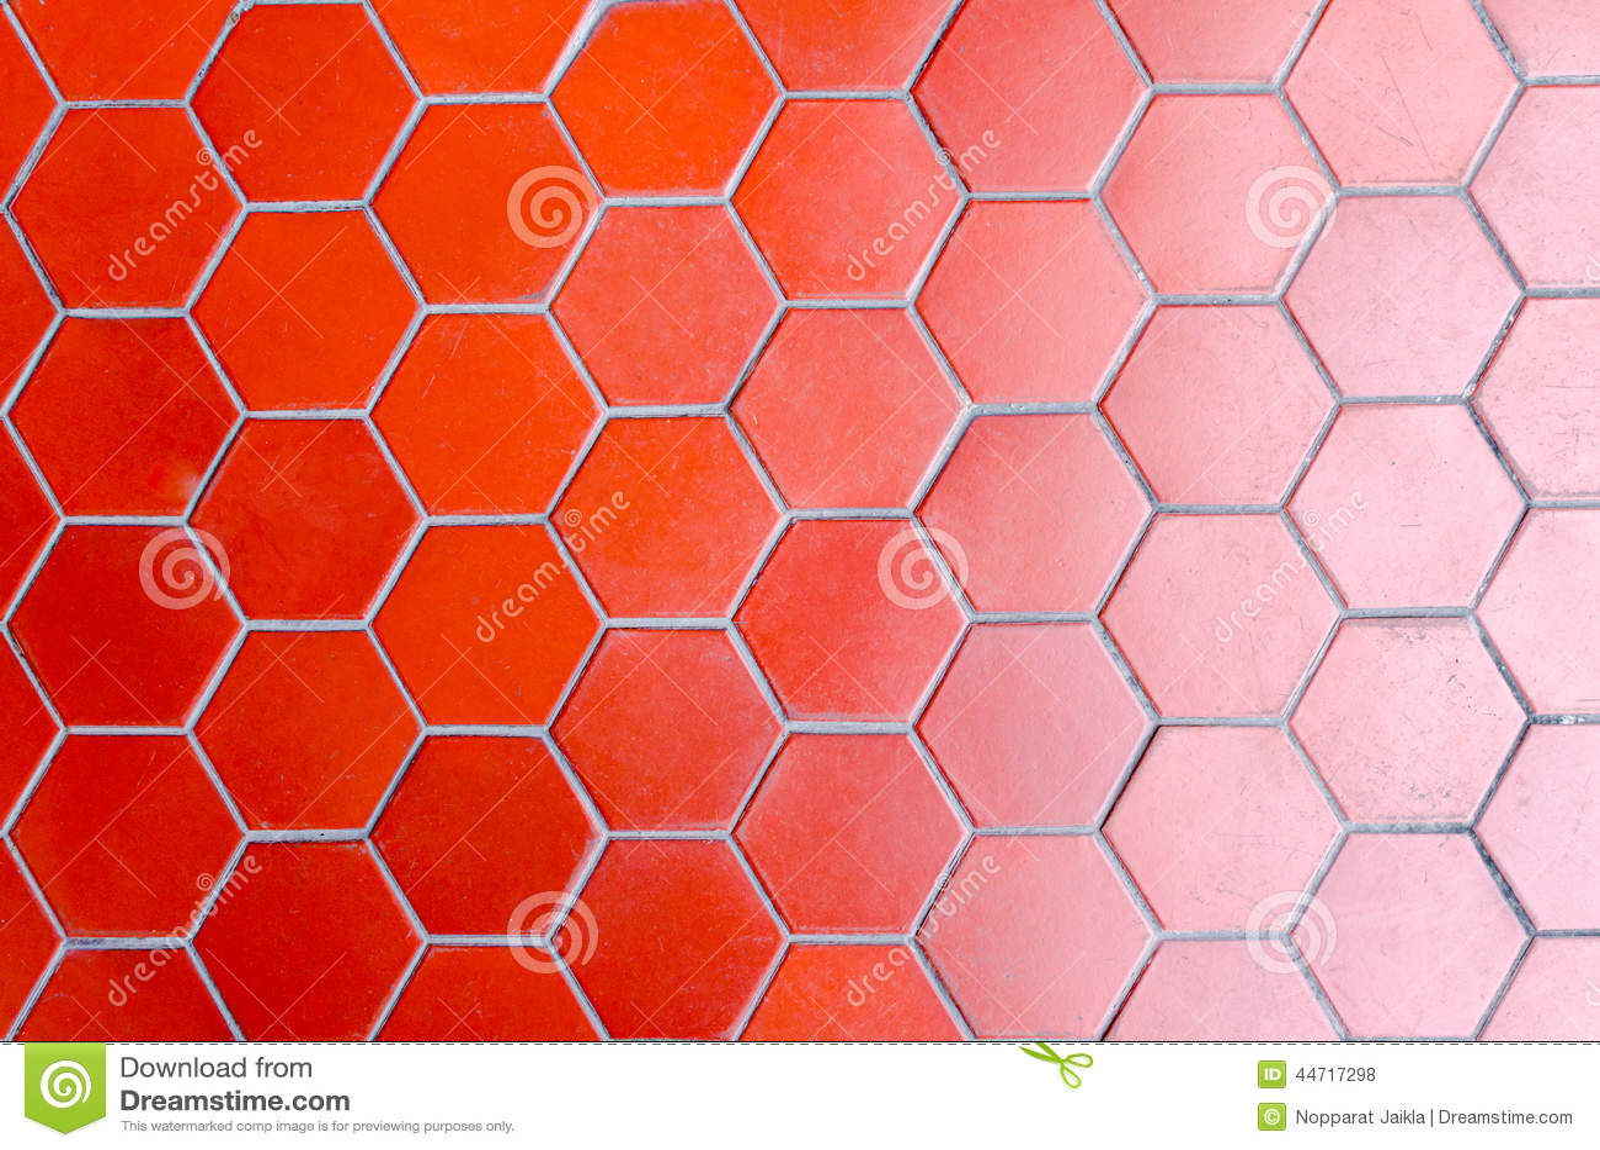 Gradient For Bathroom Floor : Red tile floor gradient two tone stock photo image